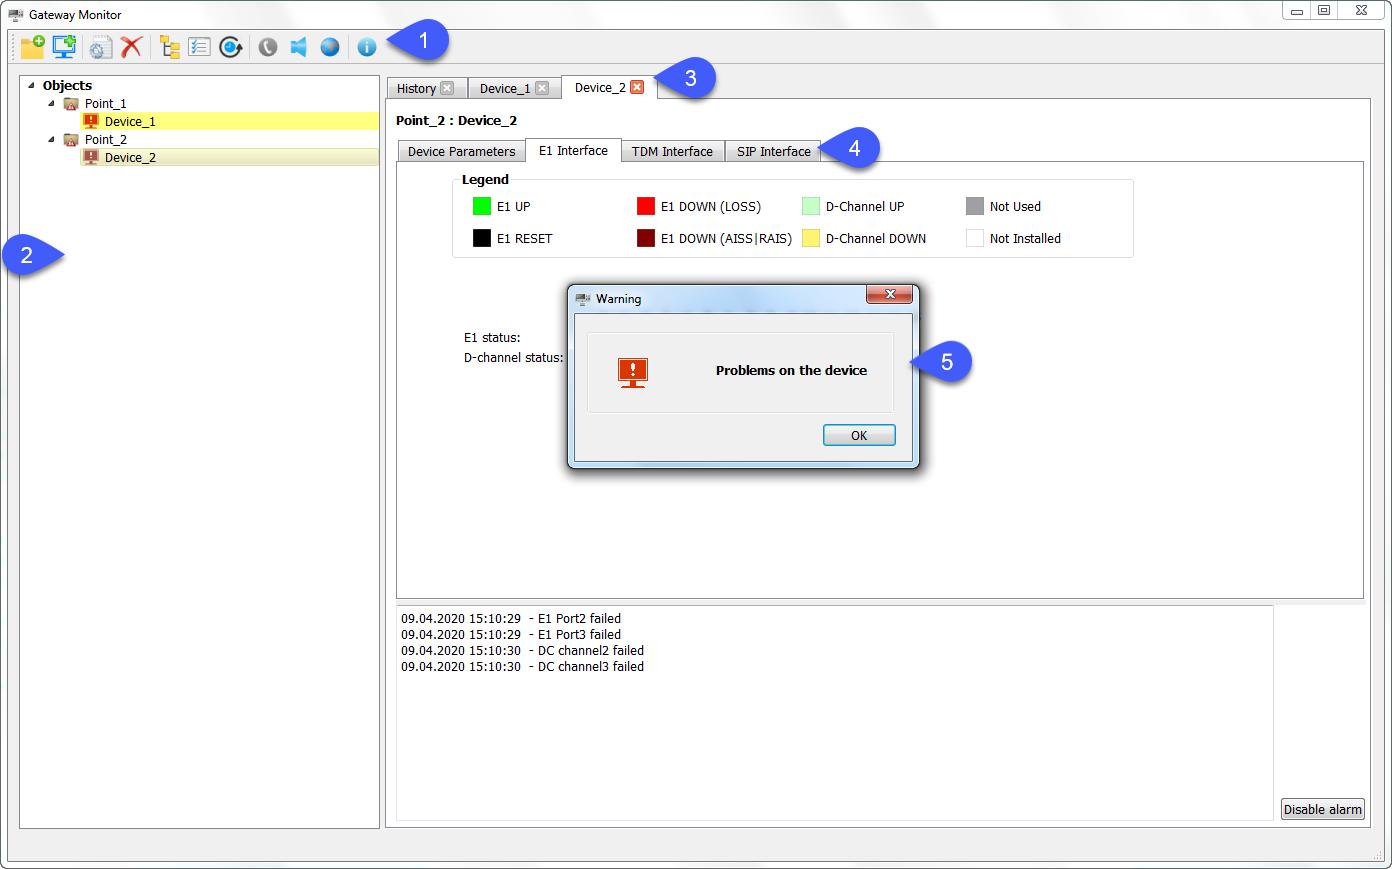 Gateway Monitor program interface appearance